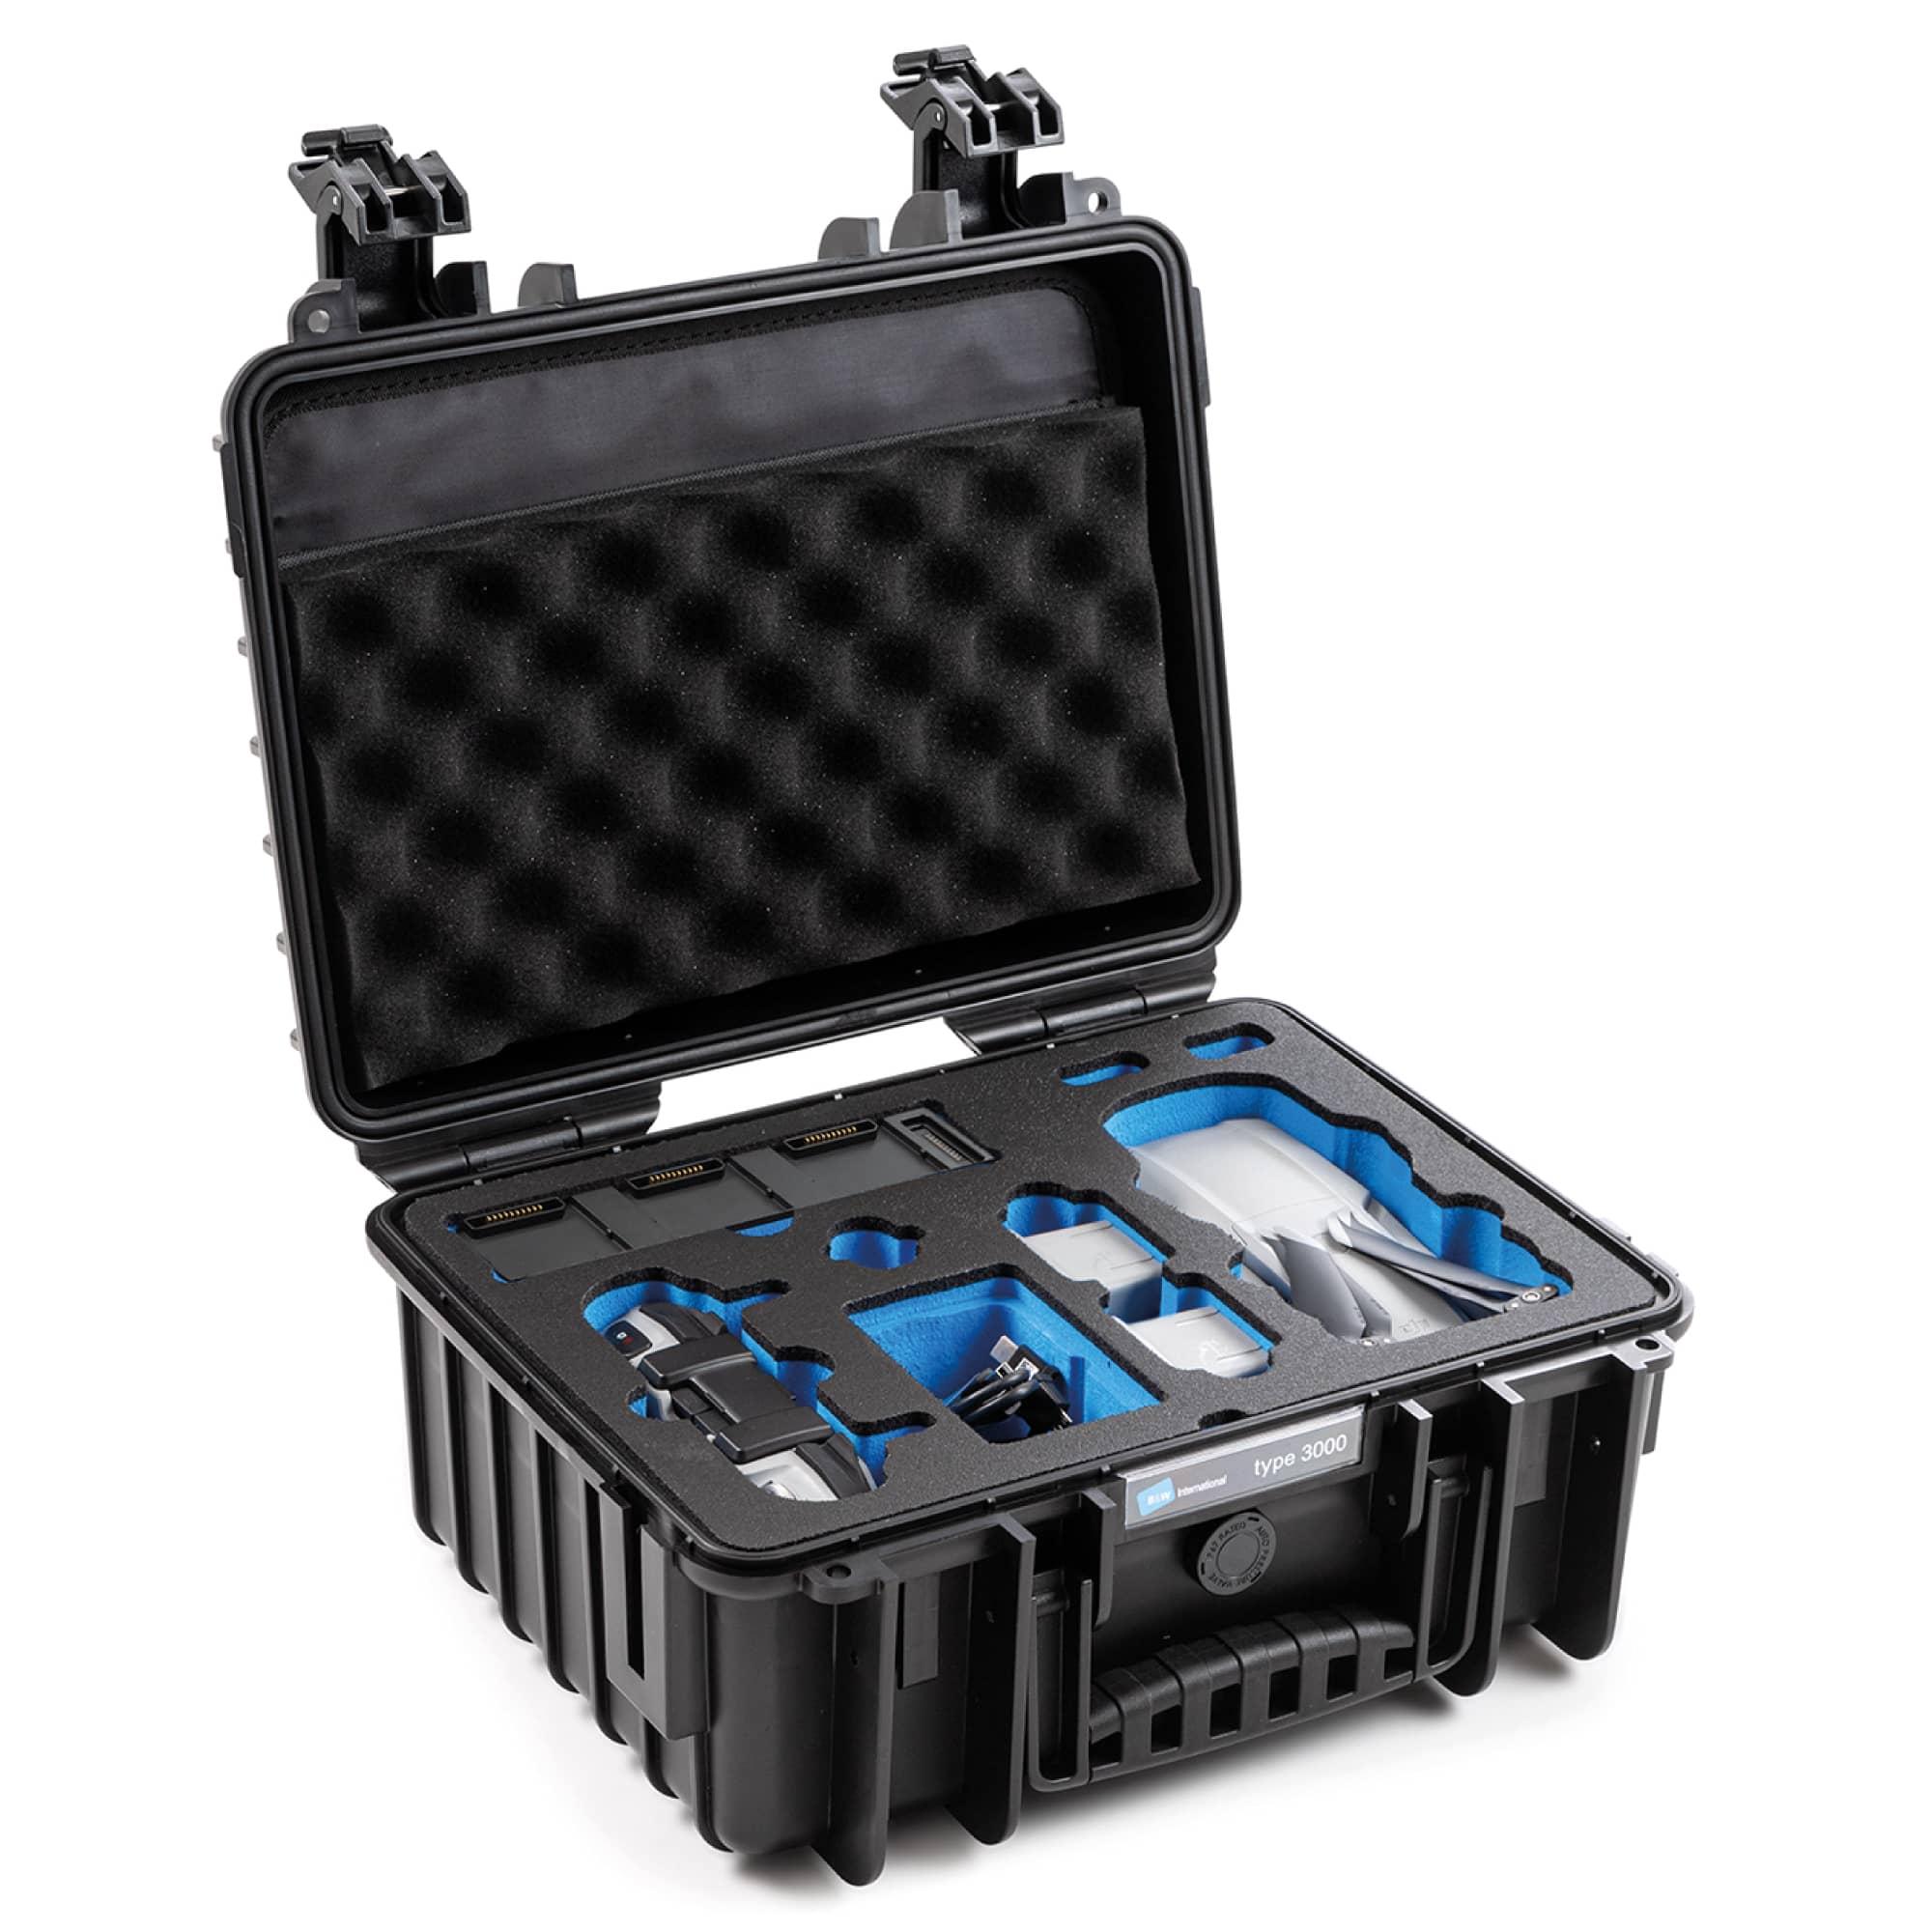 B&W Special Case Typ 3000 mit 3D-Schaum für DJI Mavic Air 2 | DJI Air 2S